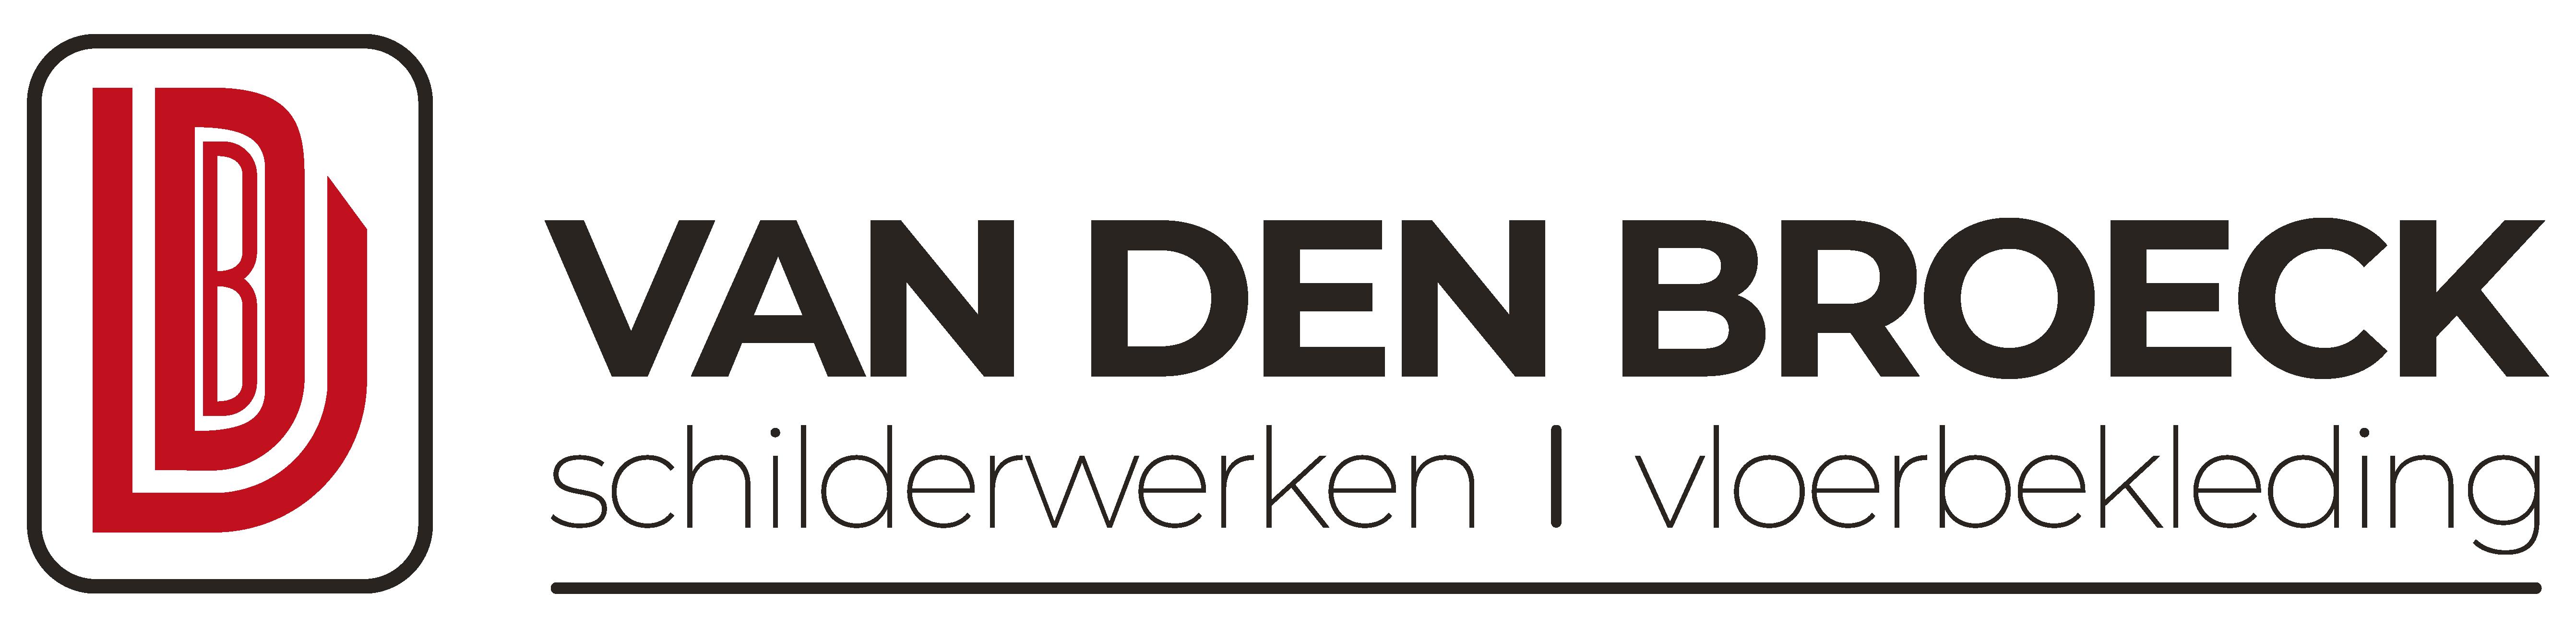 VanDenBroeck_Schilderwerken_DeMakersBureau